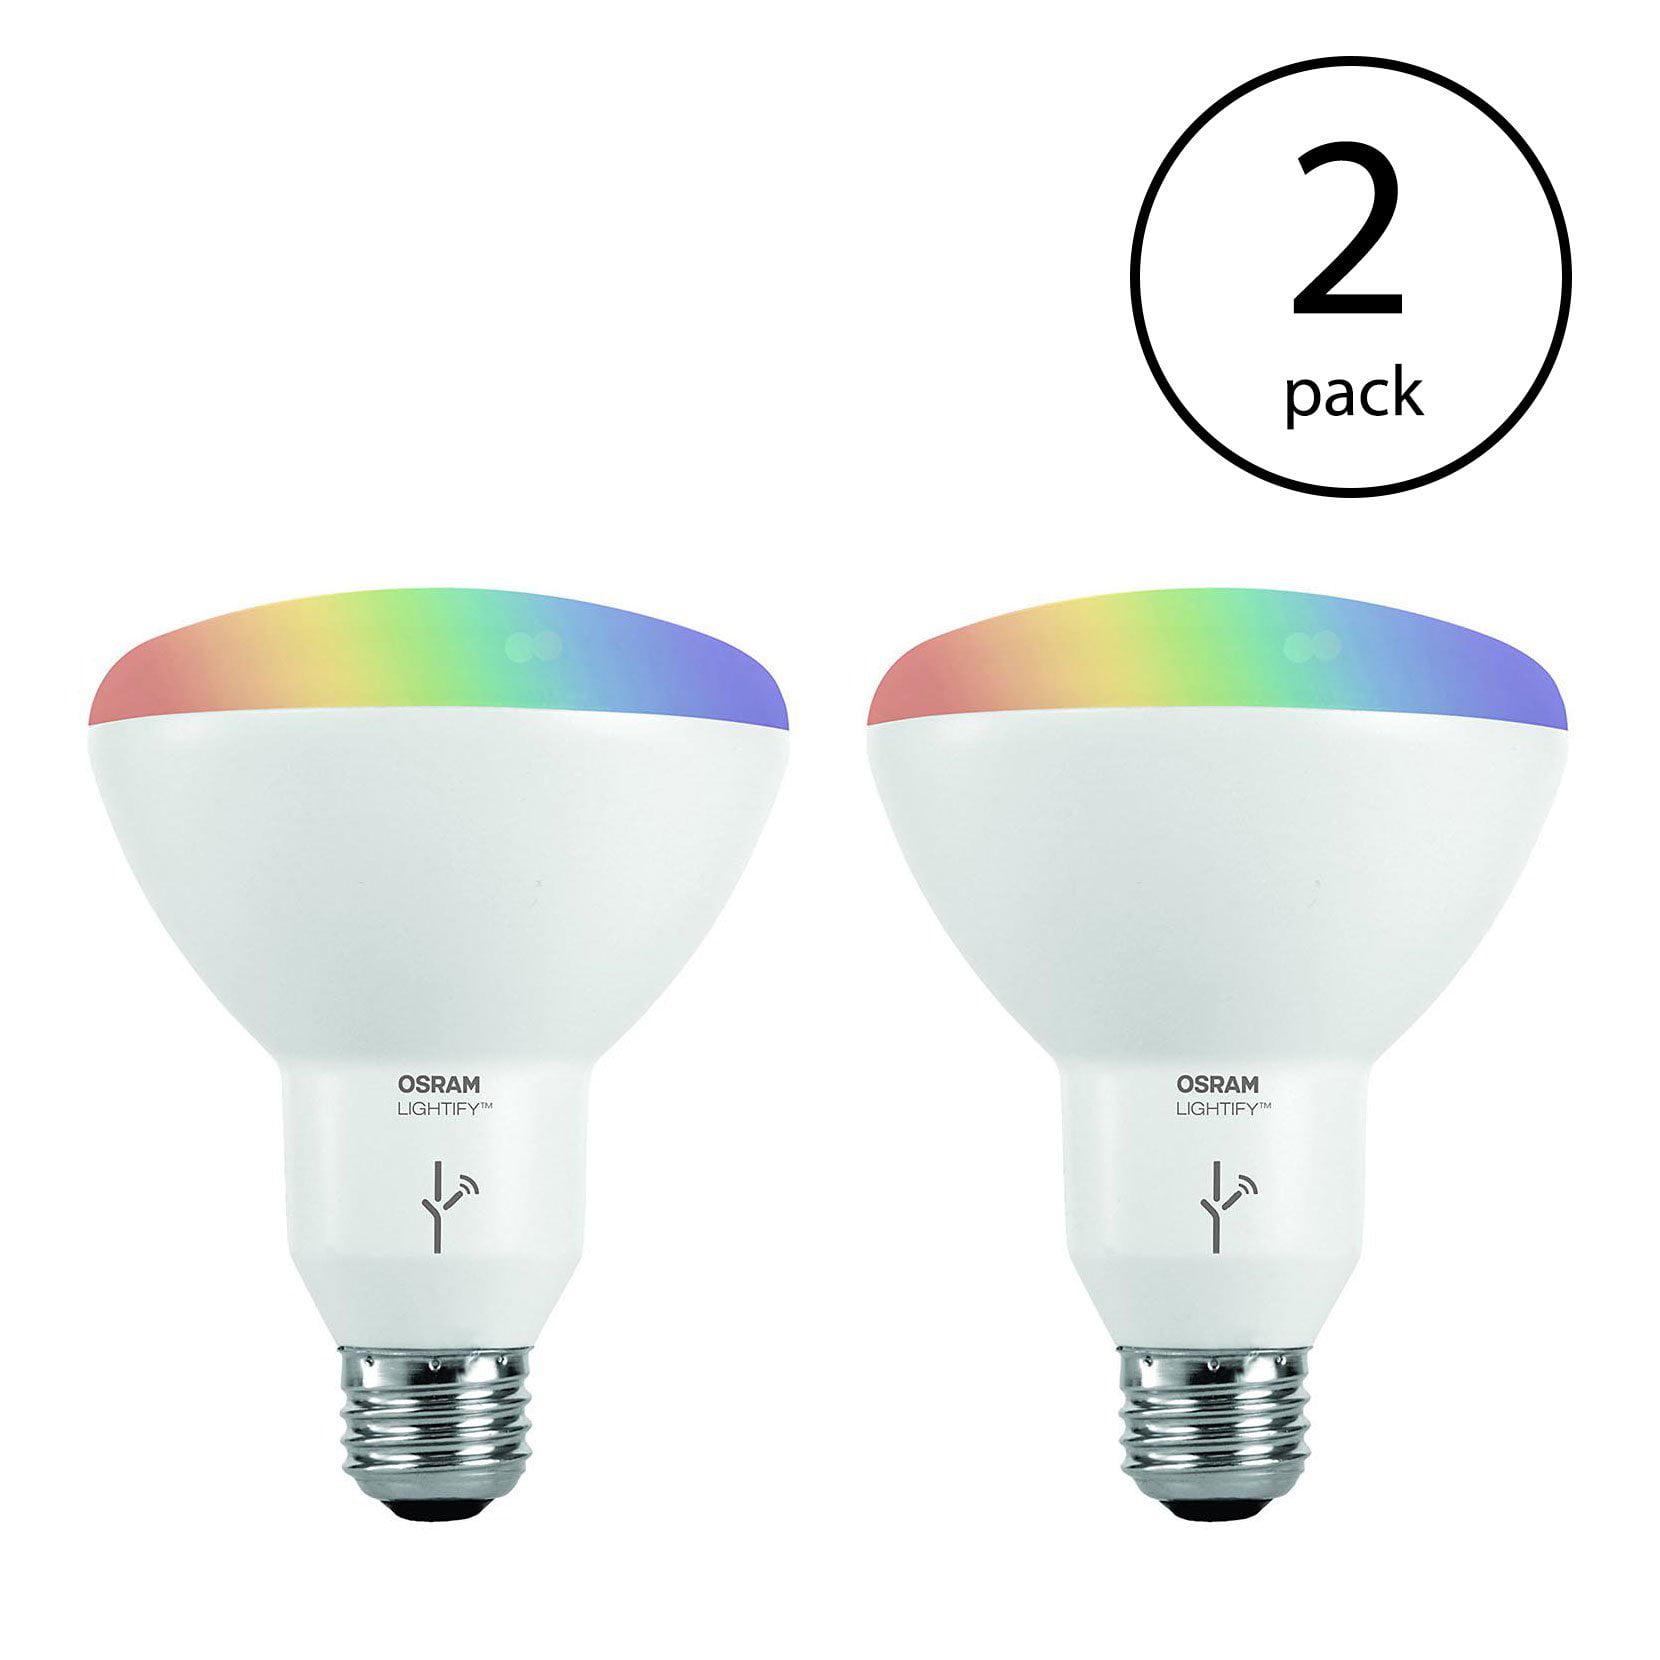 Sylvania Osram Lightify Smart Home 65W BR30 White/Color LED Light Bulb (4 Bulbs)